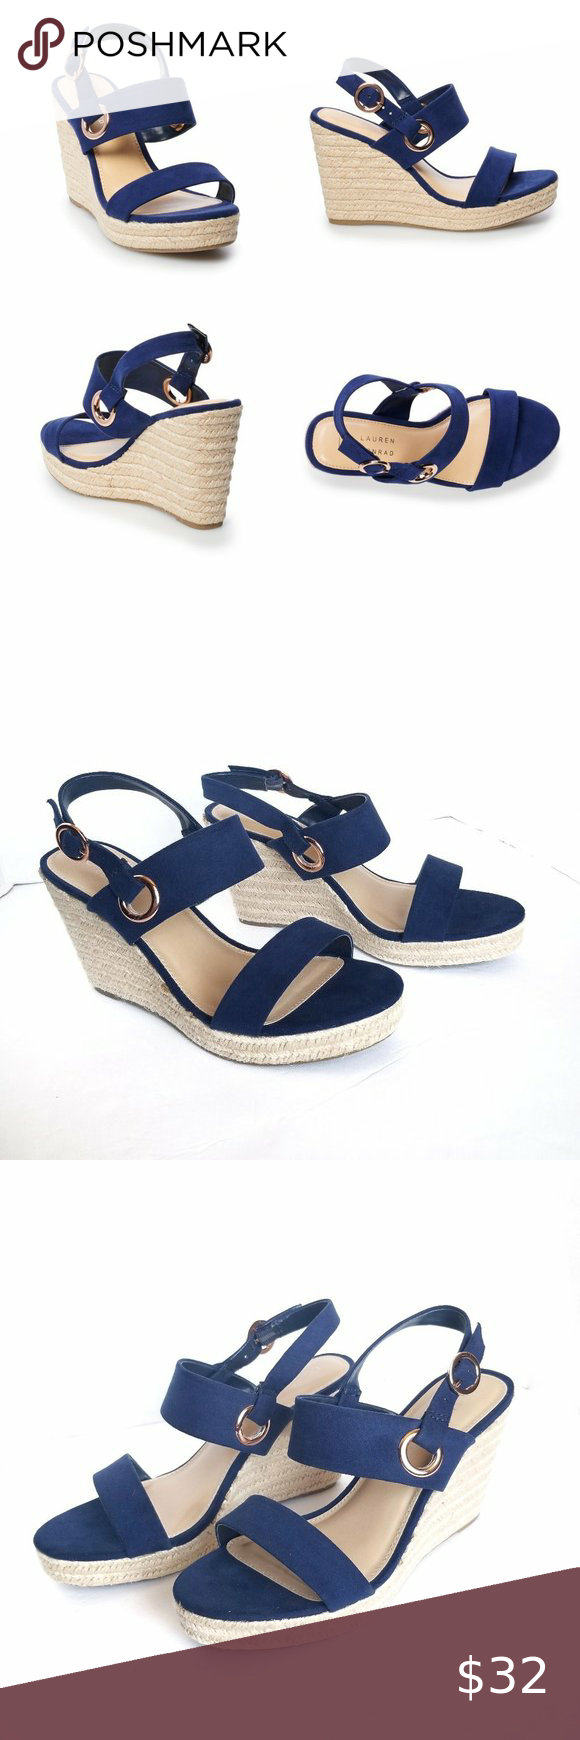 LC Lauren Conrad Carmen Womens Multi-Strap Sandals, Size